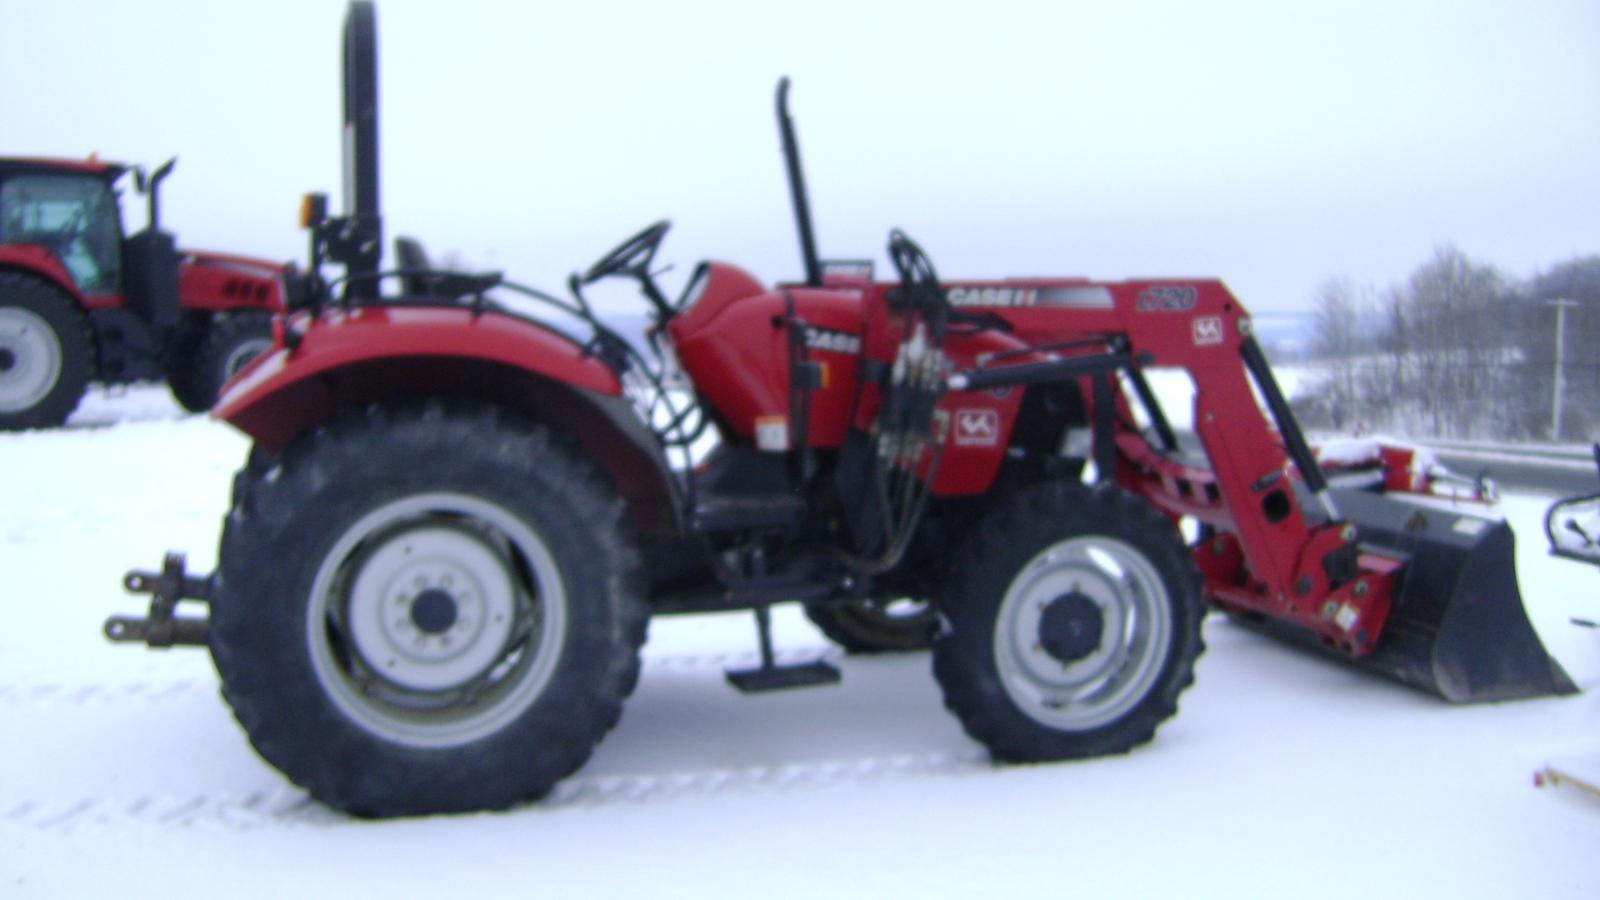 Z62600 Case IH JX60 Tractor (4) (1) case ih jx60 for sale in cazenovia, ny empire tractor, inc